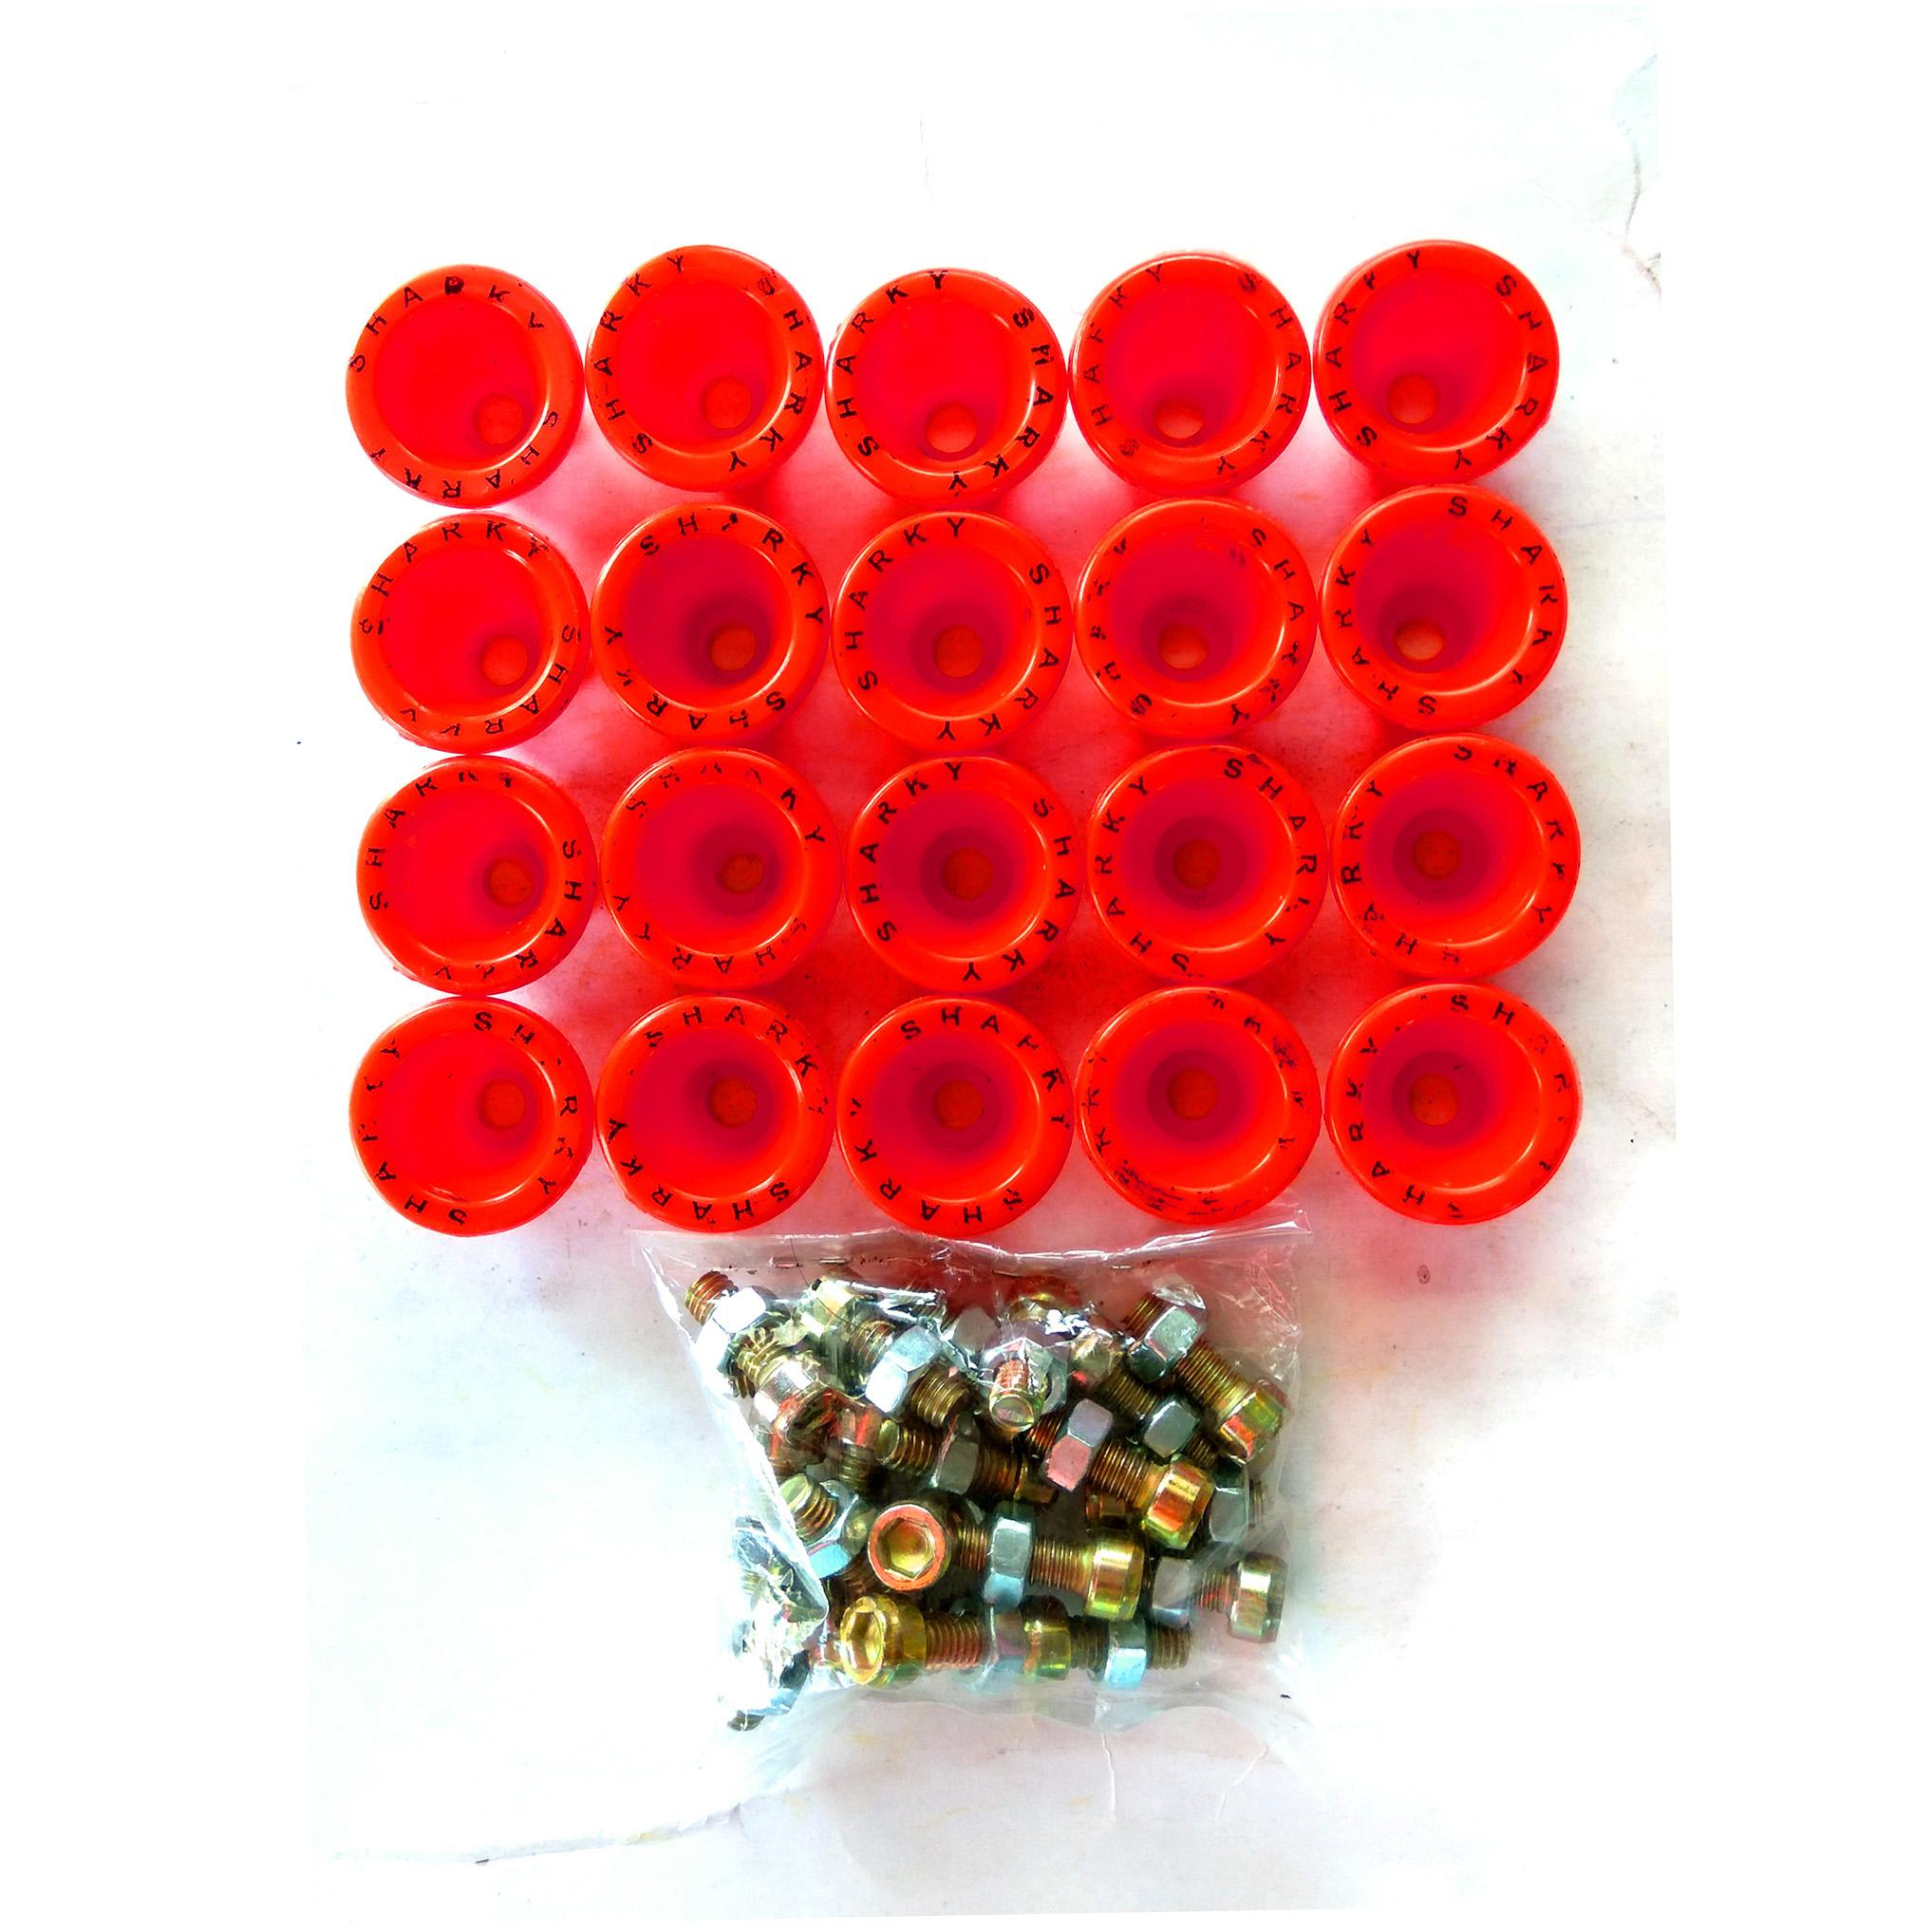 Spesifikasi dari Ring Monel SHARKY Isi 20Pcs Bahan Plastik + Mur Baut - Variasi Motor - Merah